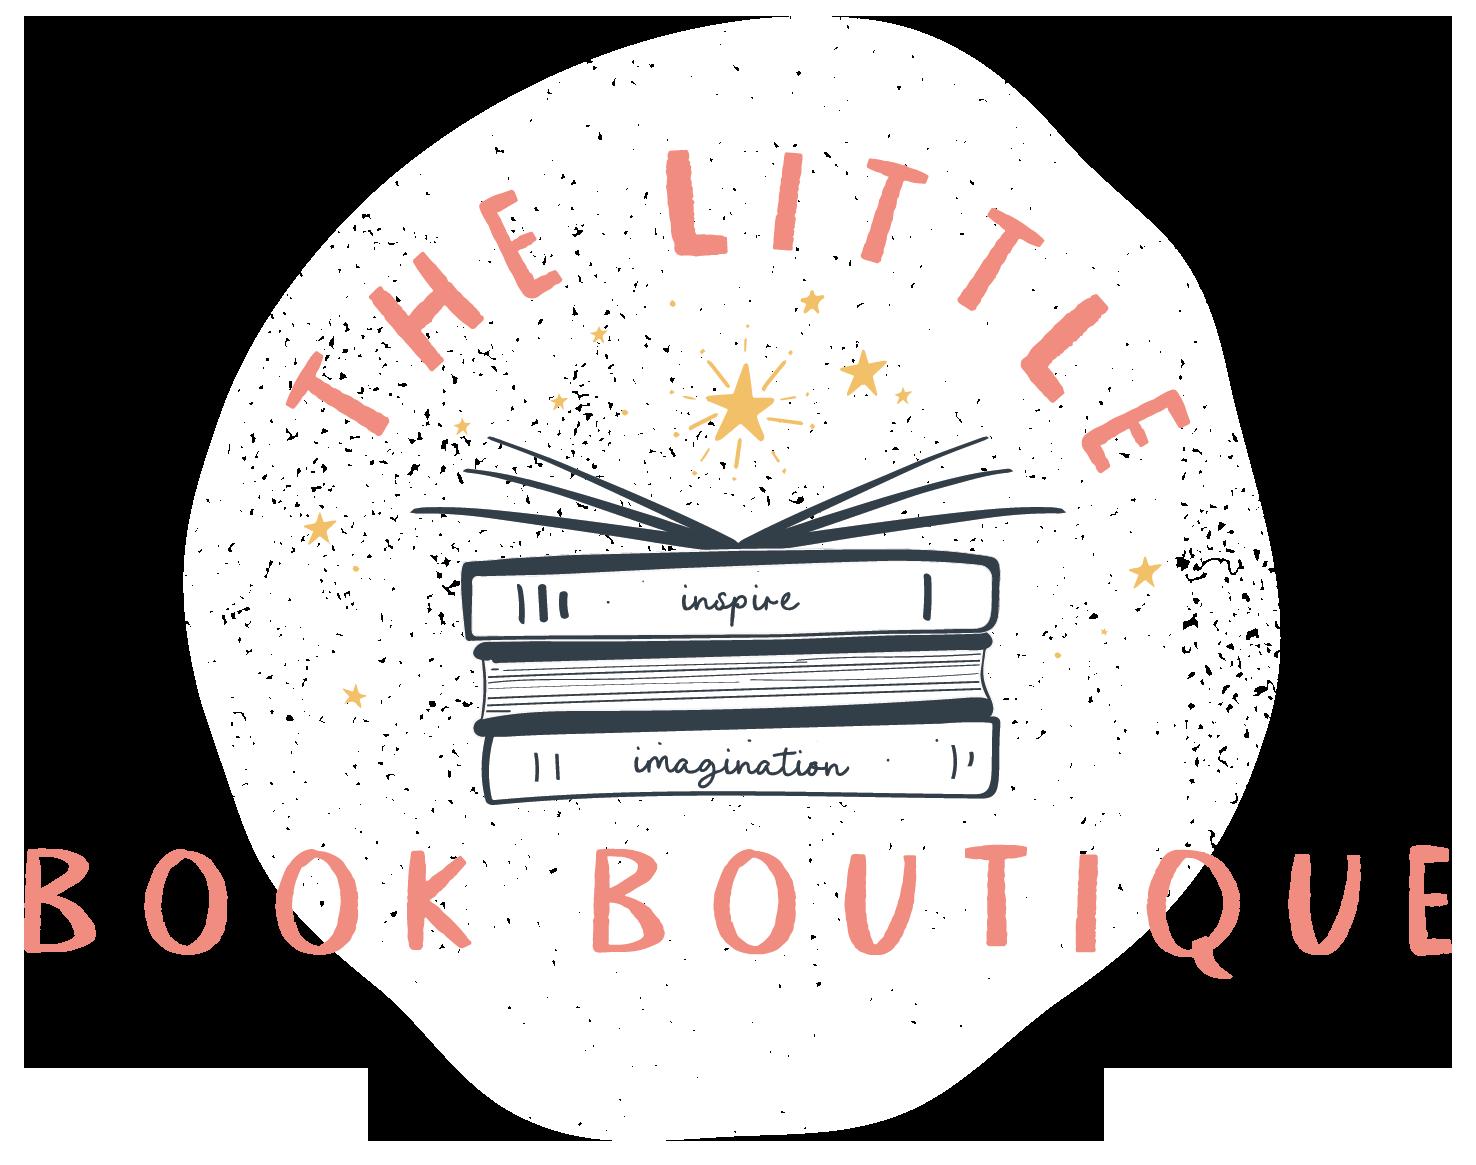 The Little Book Boutique